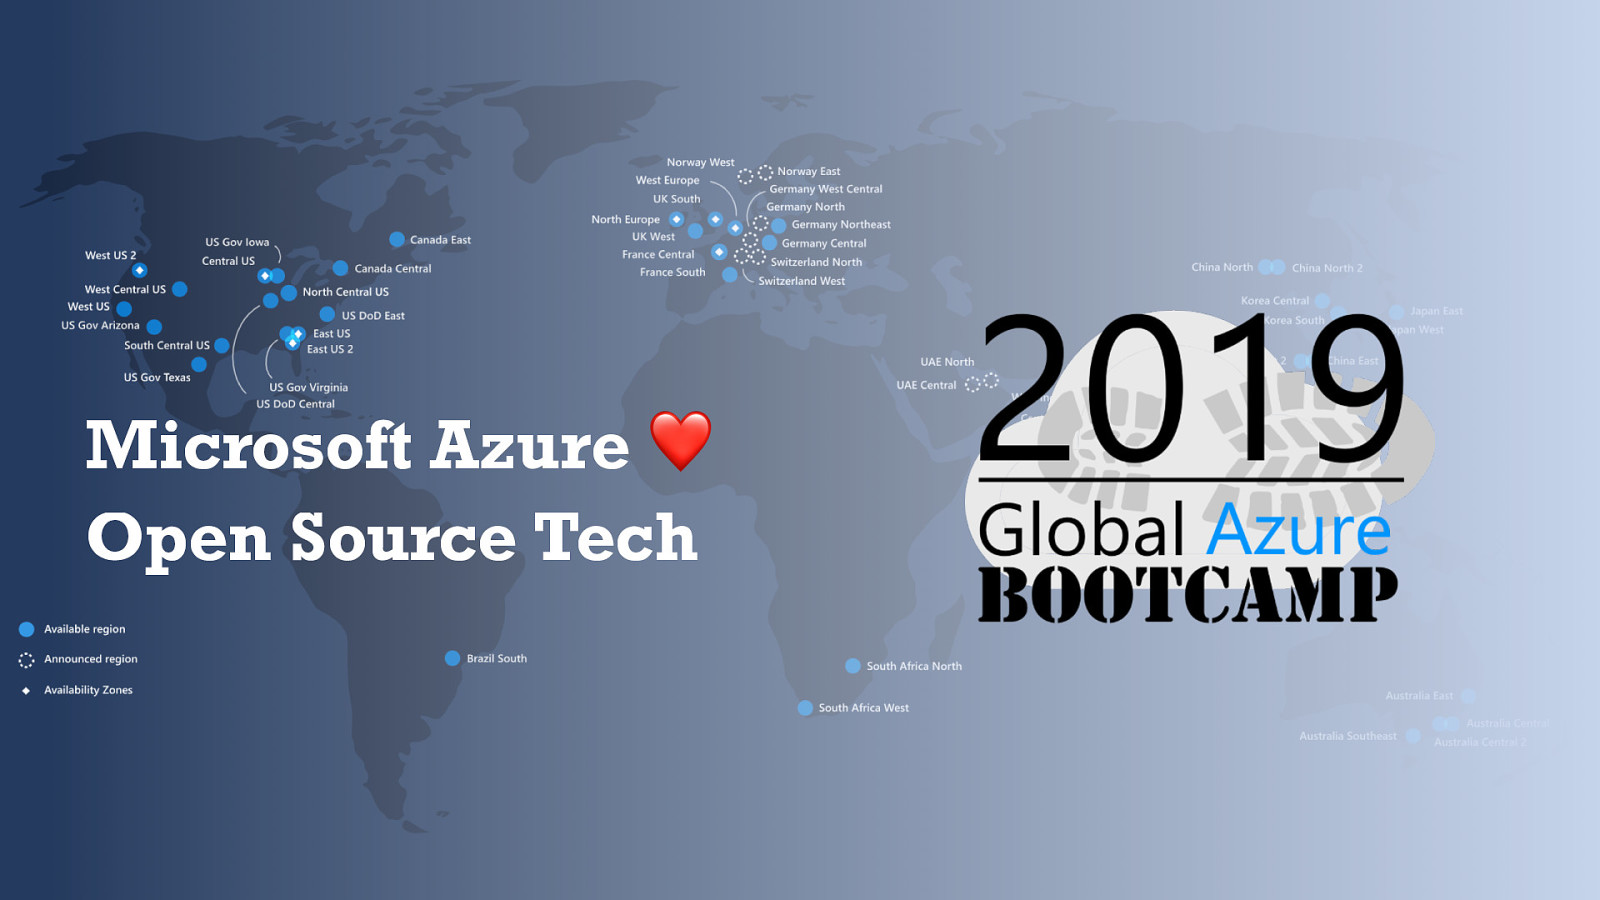 Microsoft Azure <3 Open Source Tech